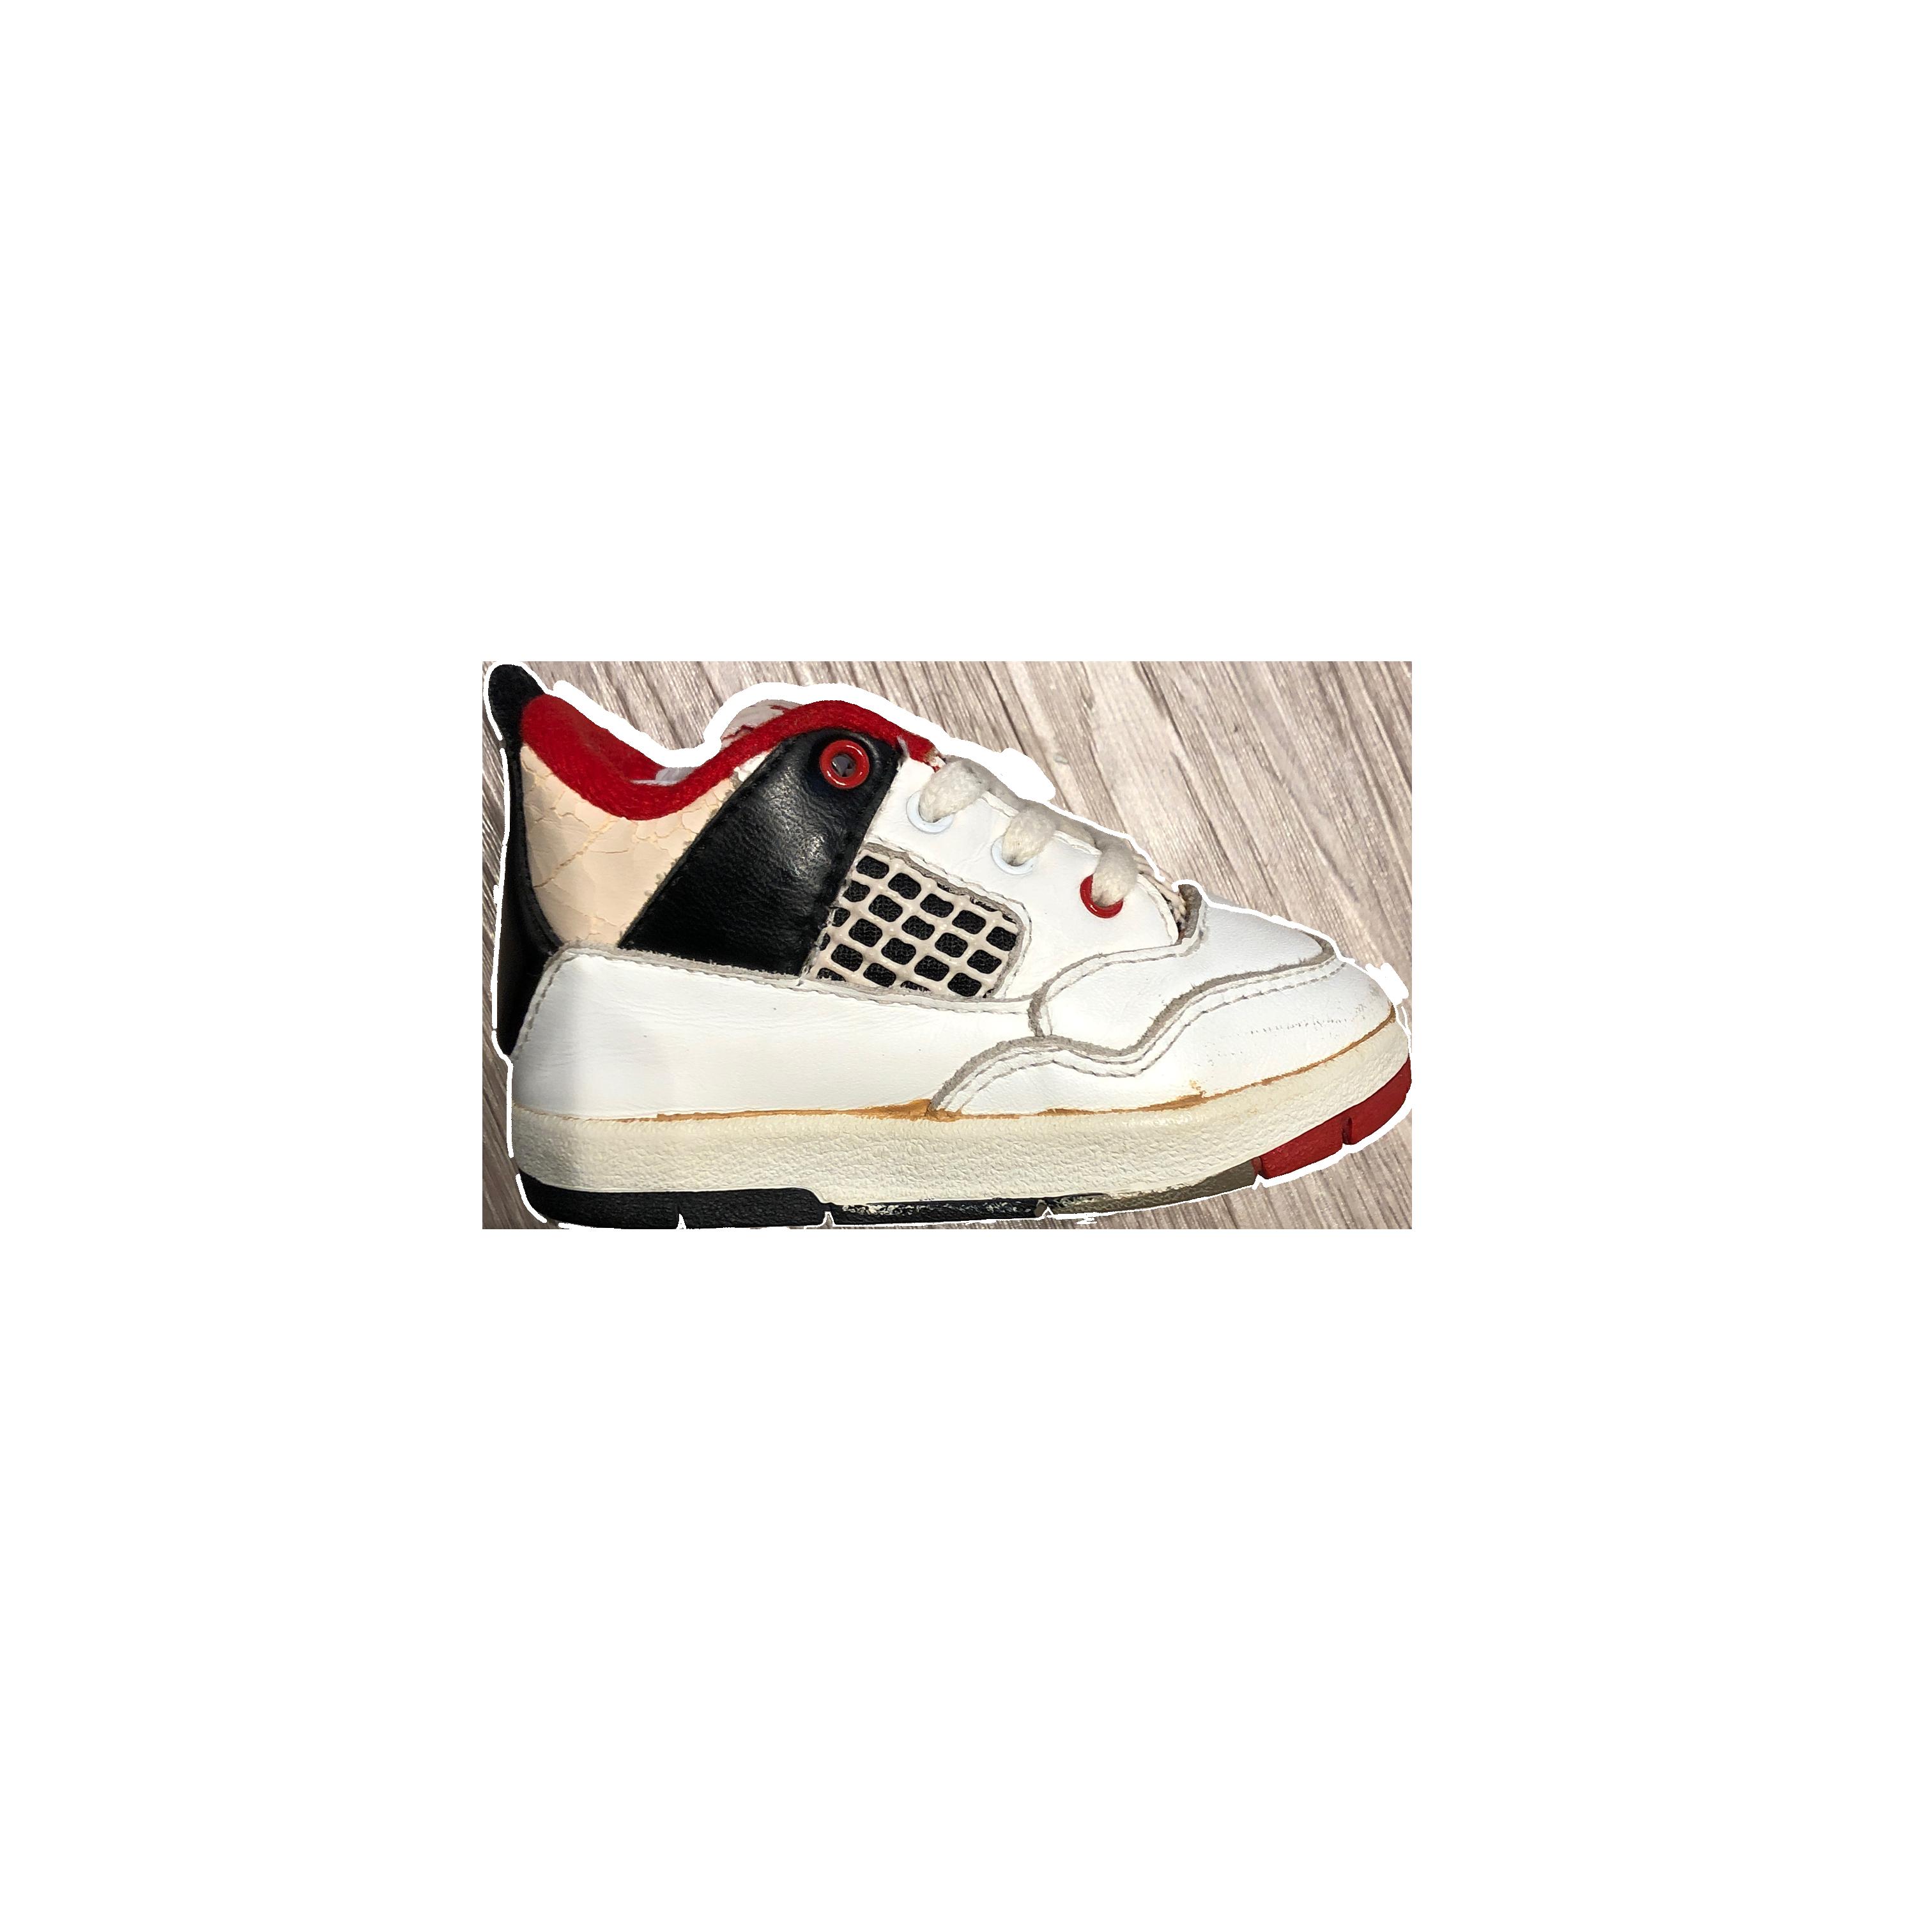 1989 Air Jordan 4 | Size 5 infant